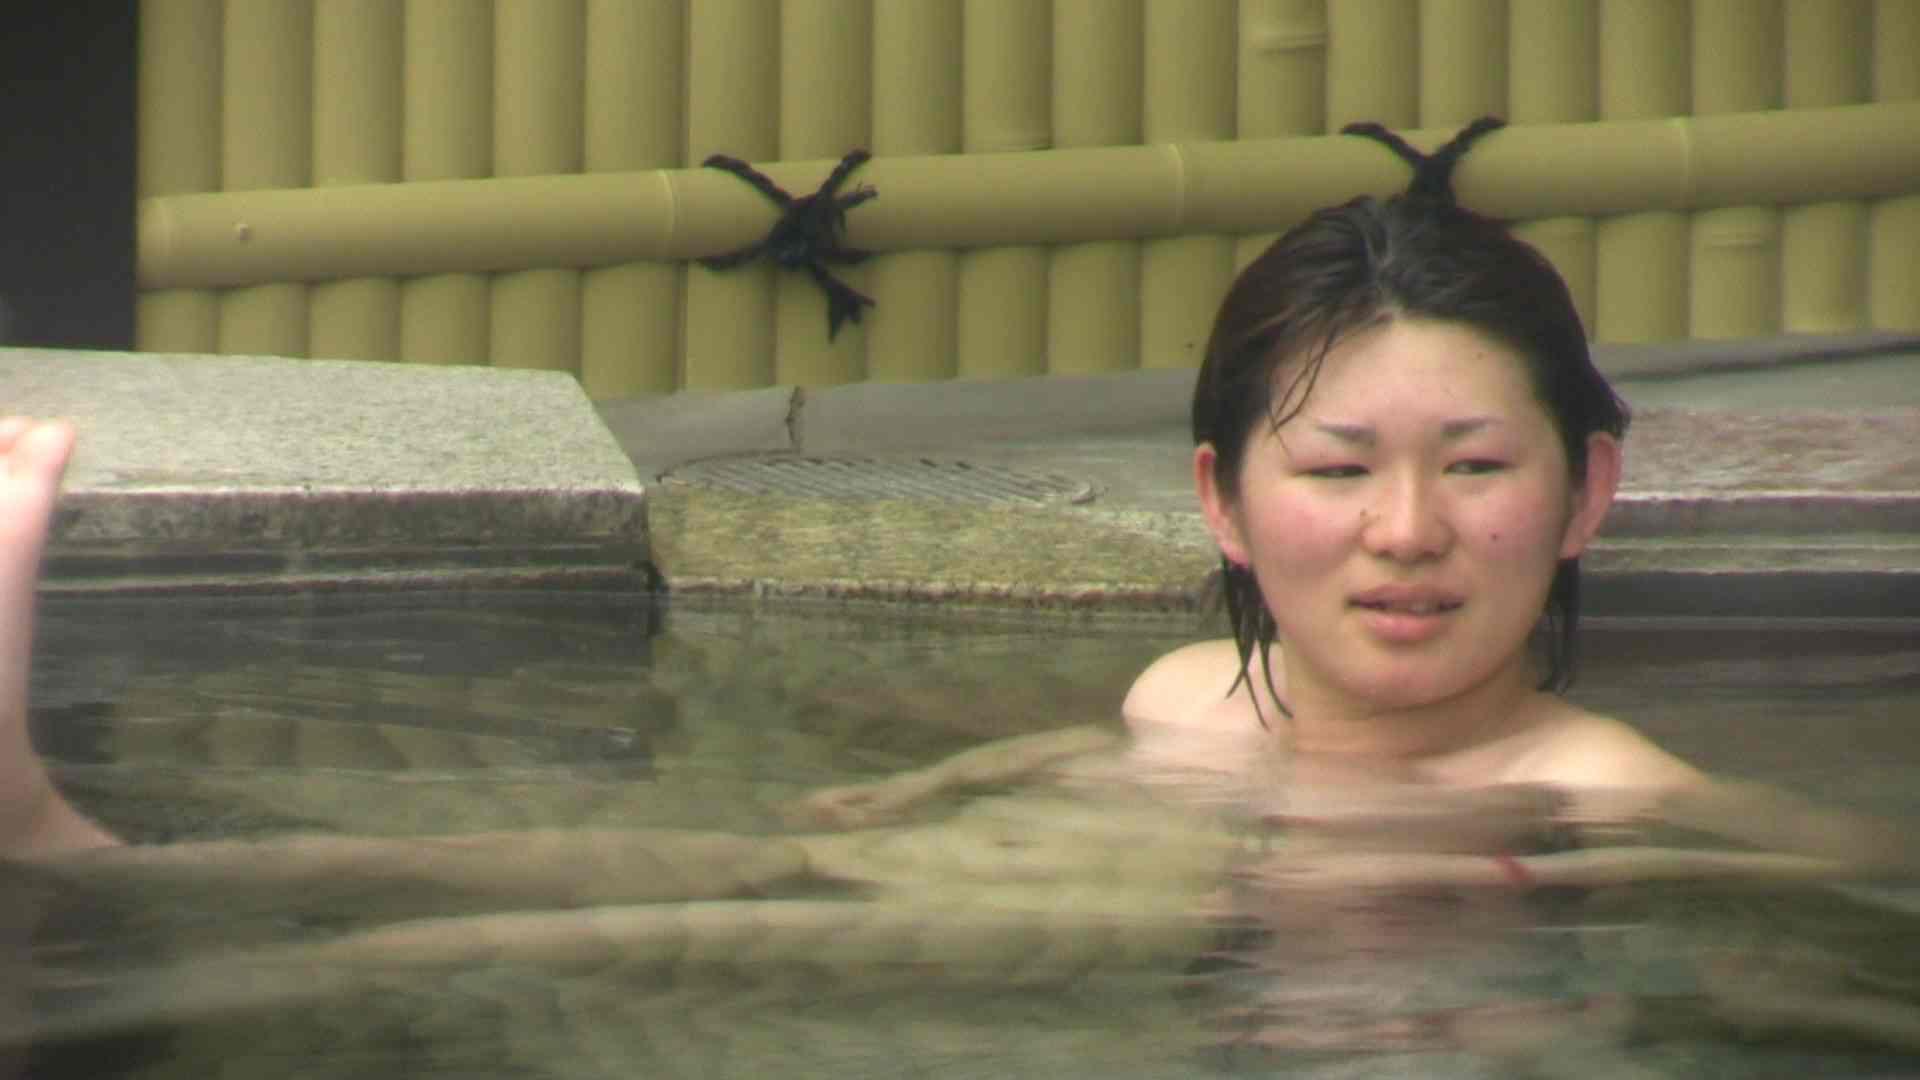 Aquaな露天風呂Vol.673 露天風呂 | OLのエロ生活  45連発 37